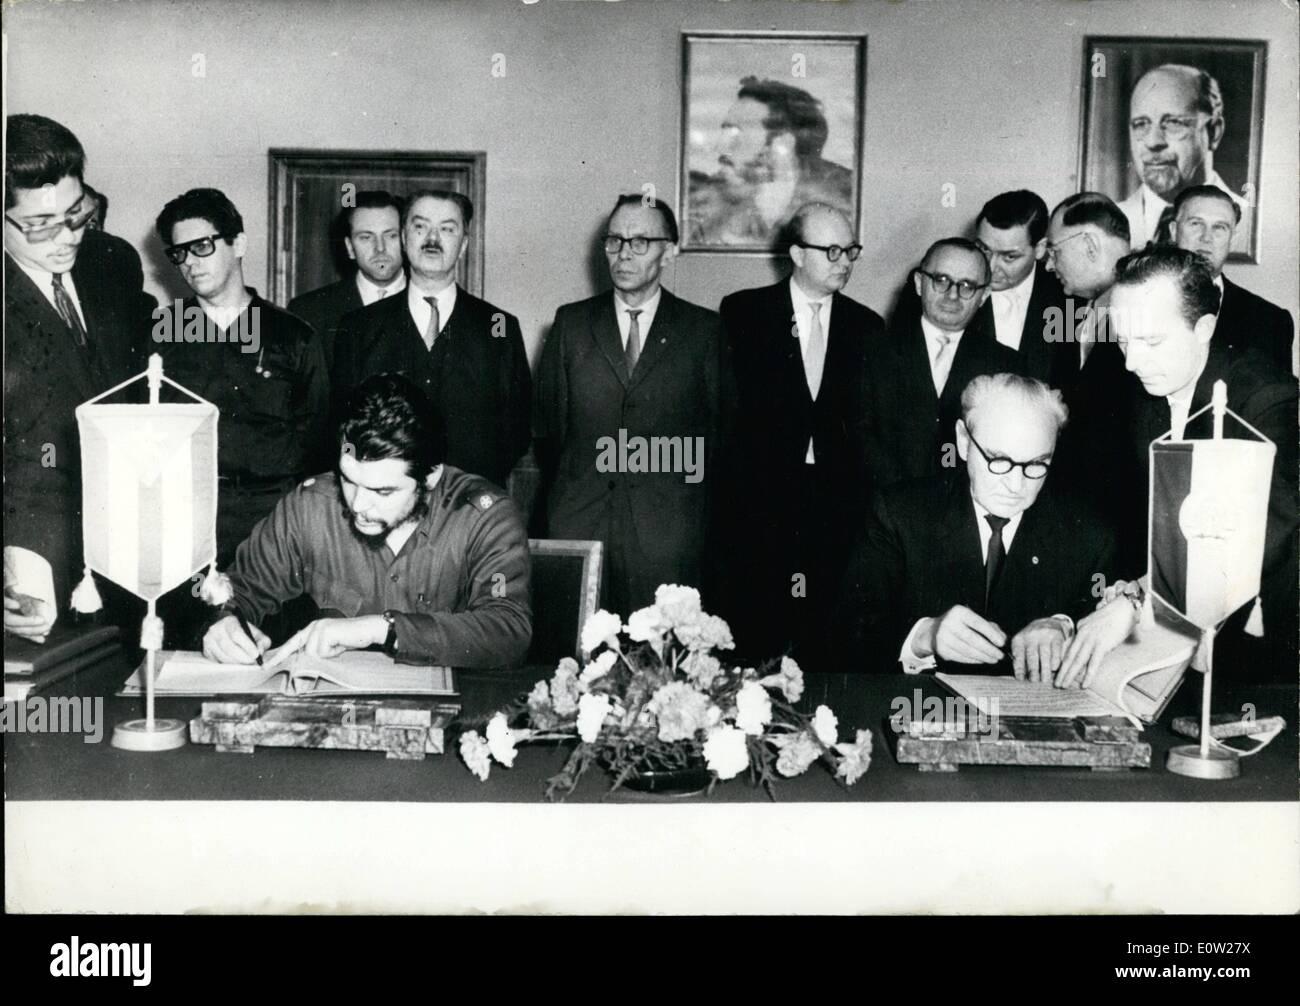 Heinrich Rau Stockfotos & Heinrich Rau Bilder - Alamy